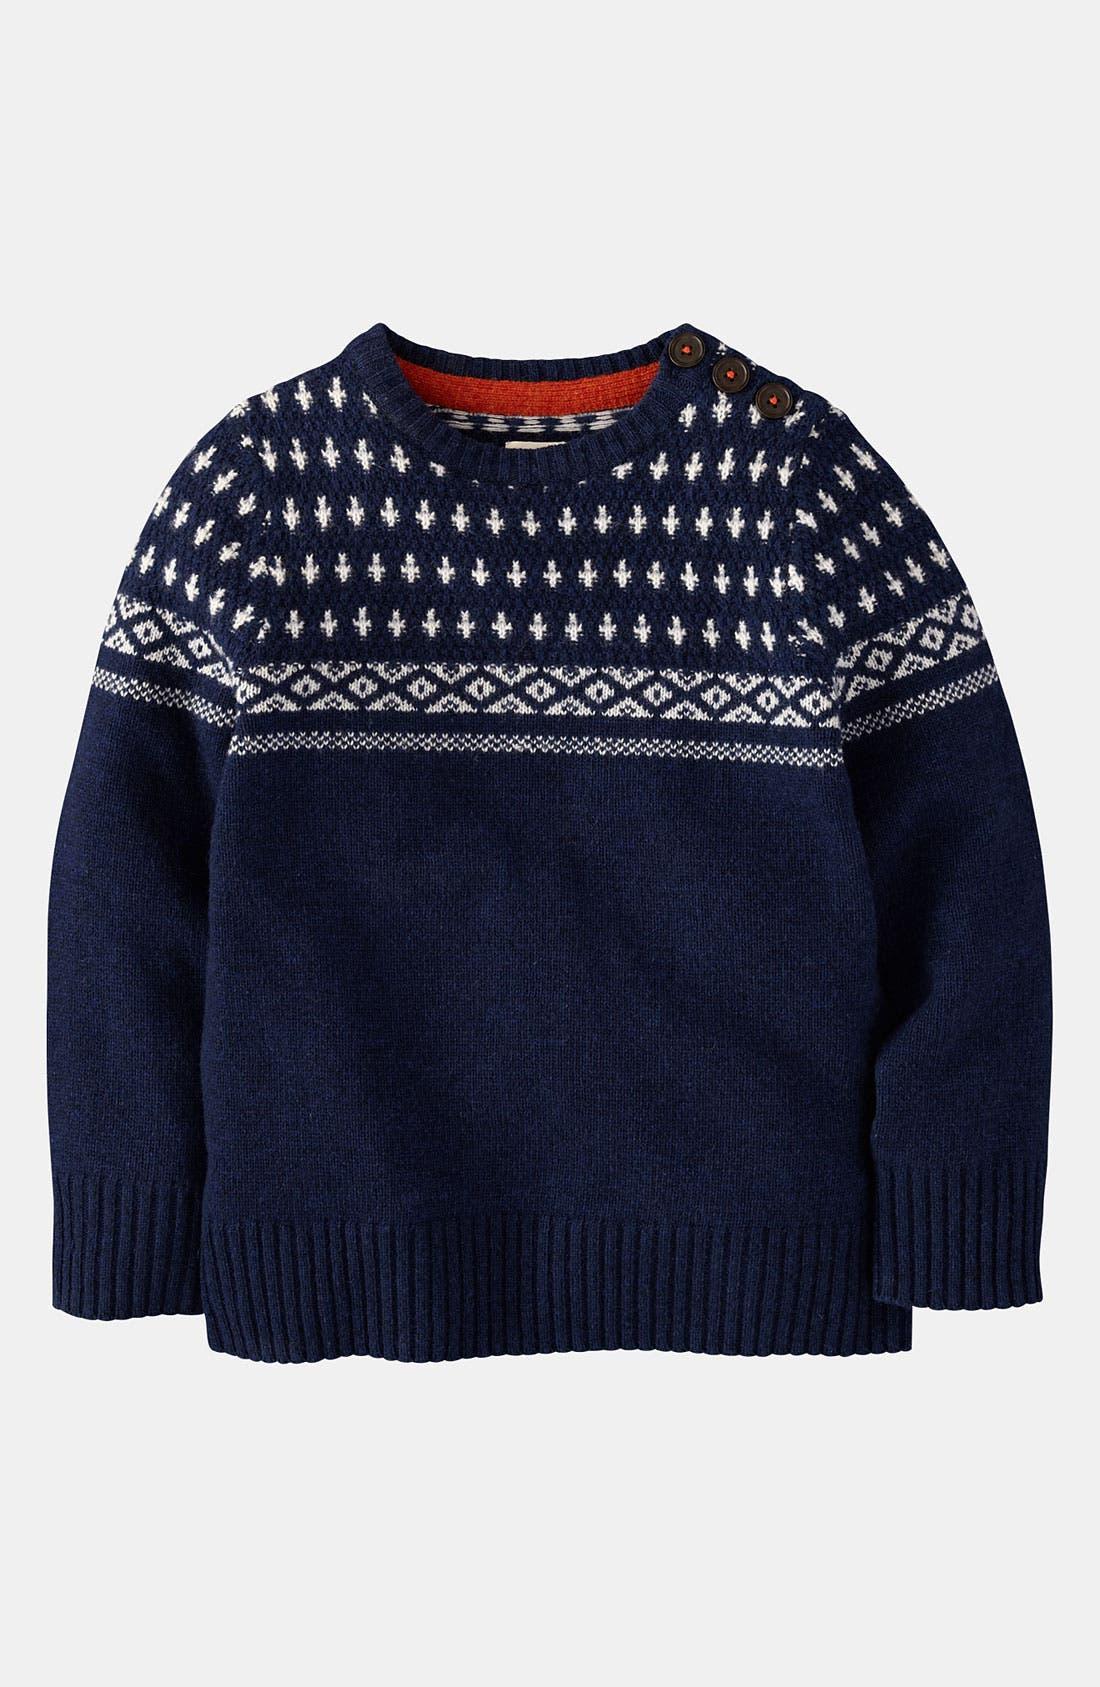 Alternate Image 1 Selected - Mini Boden Sweater (Toddler, Little Boys & Big Boys)